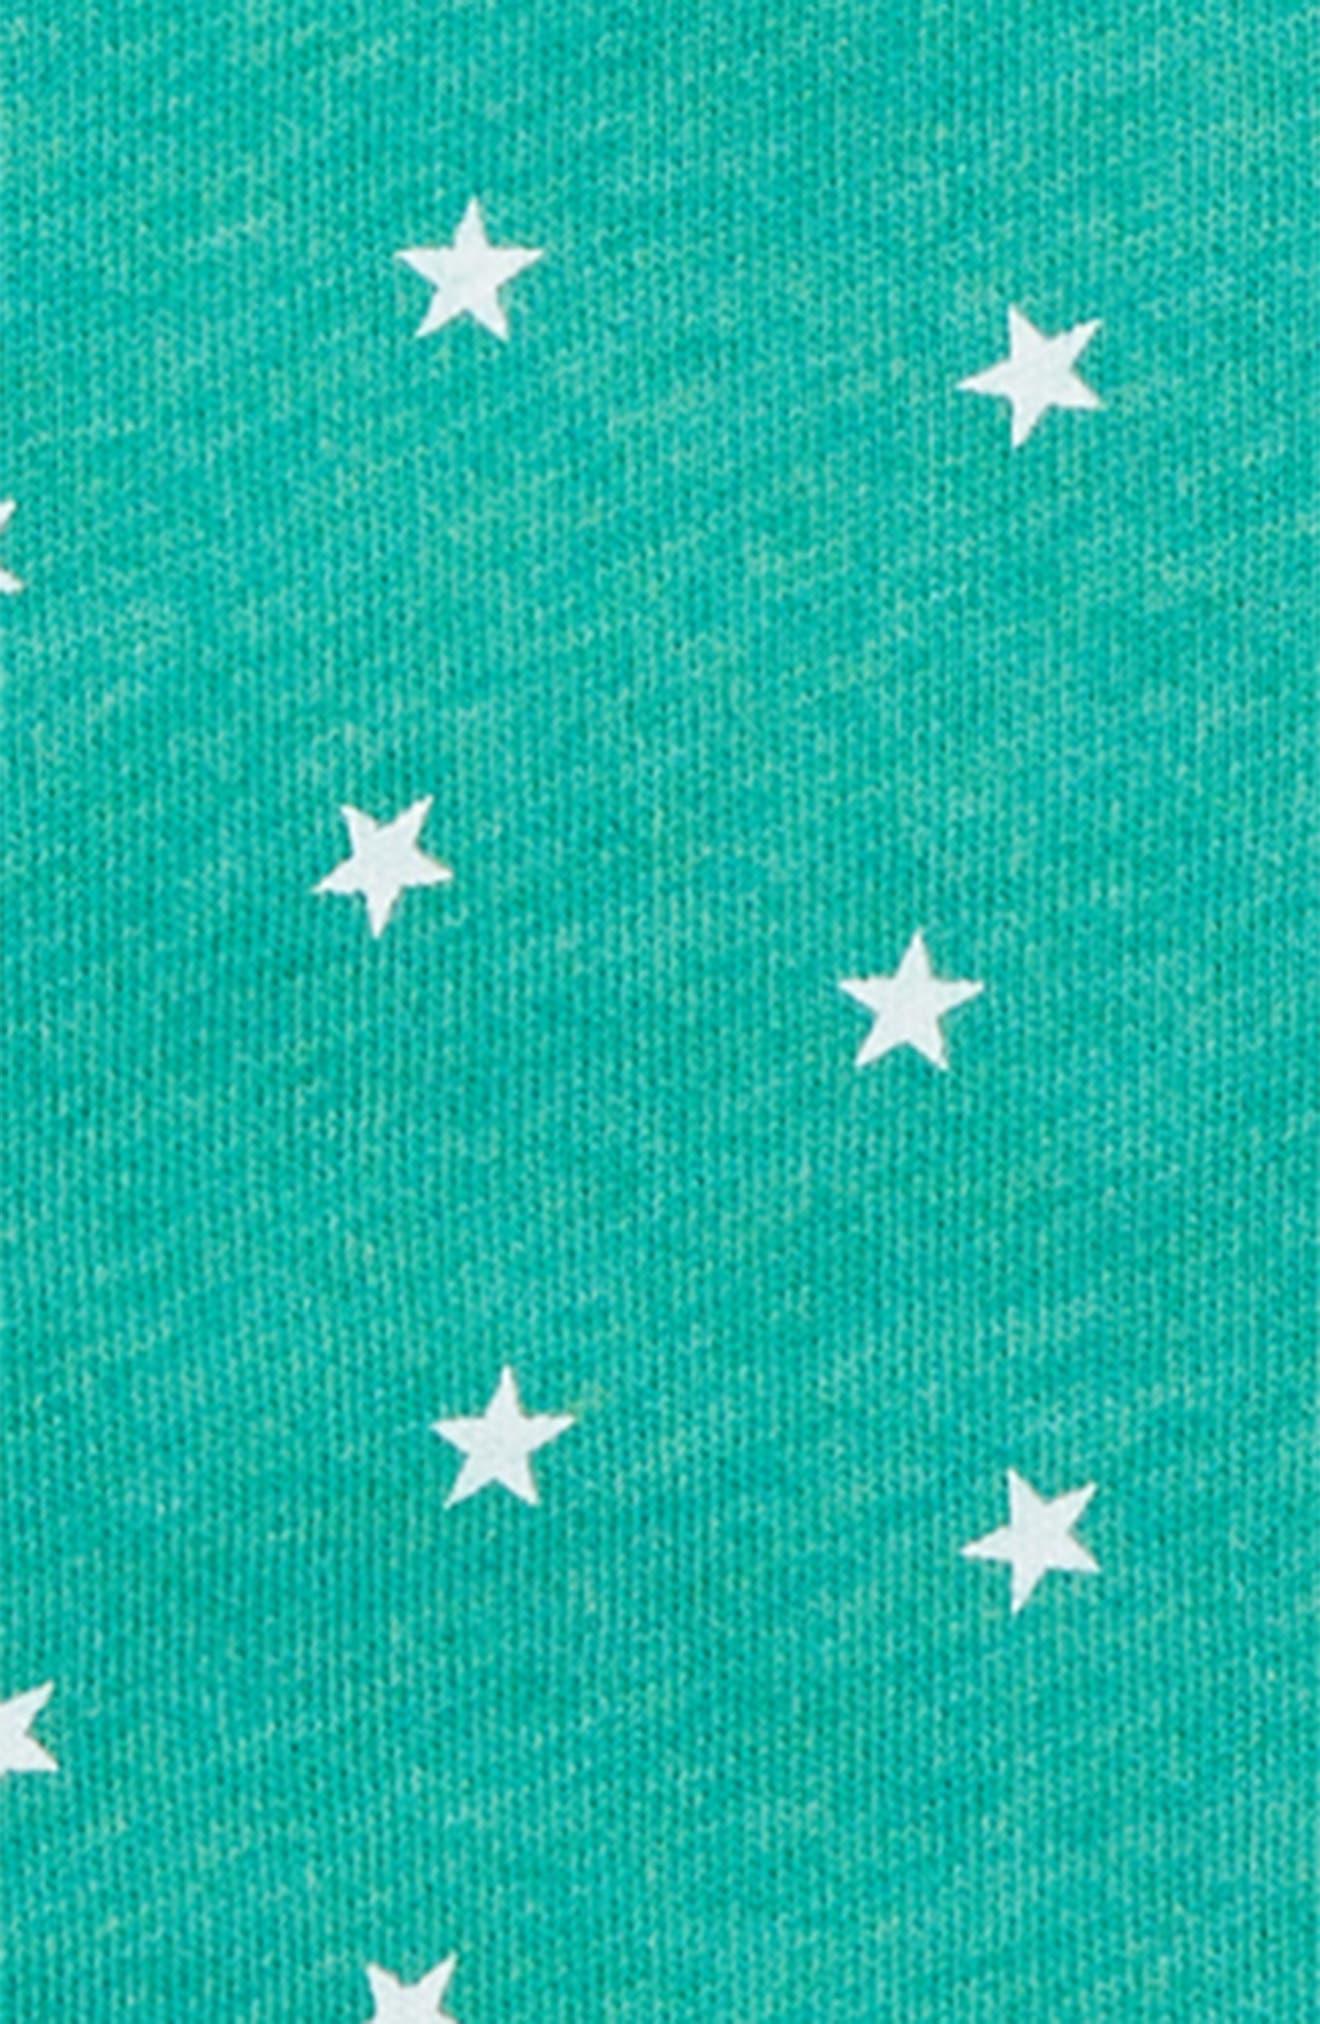 Fleece Lined Zip Hoodie,                             Alternate thumbnail 2, color,                             JUNGLE GREEN MARLE/ ECRU STARS